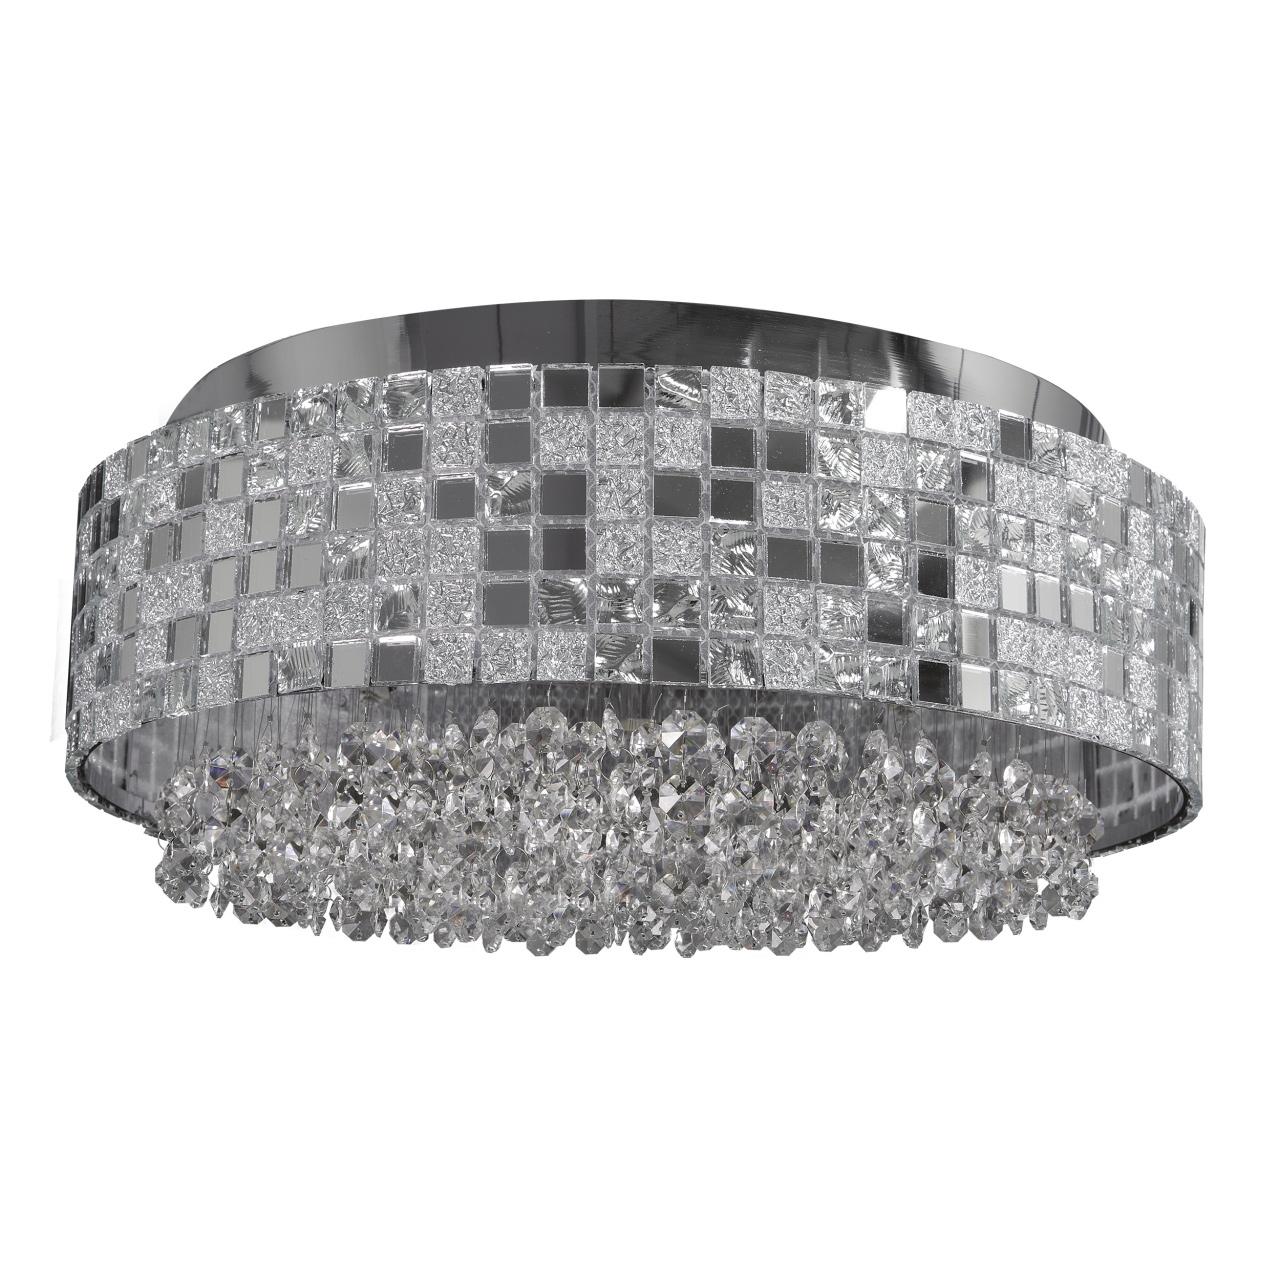 Люстра потолочная Bezazz 6х40W G9 хром Lightstar 743064